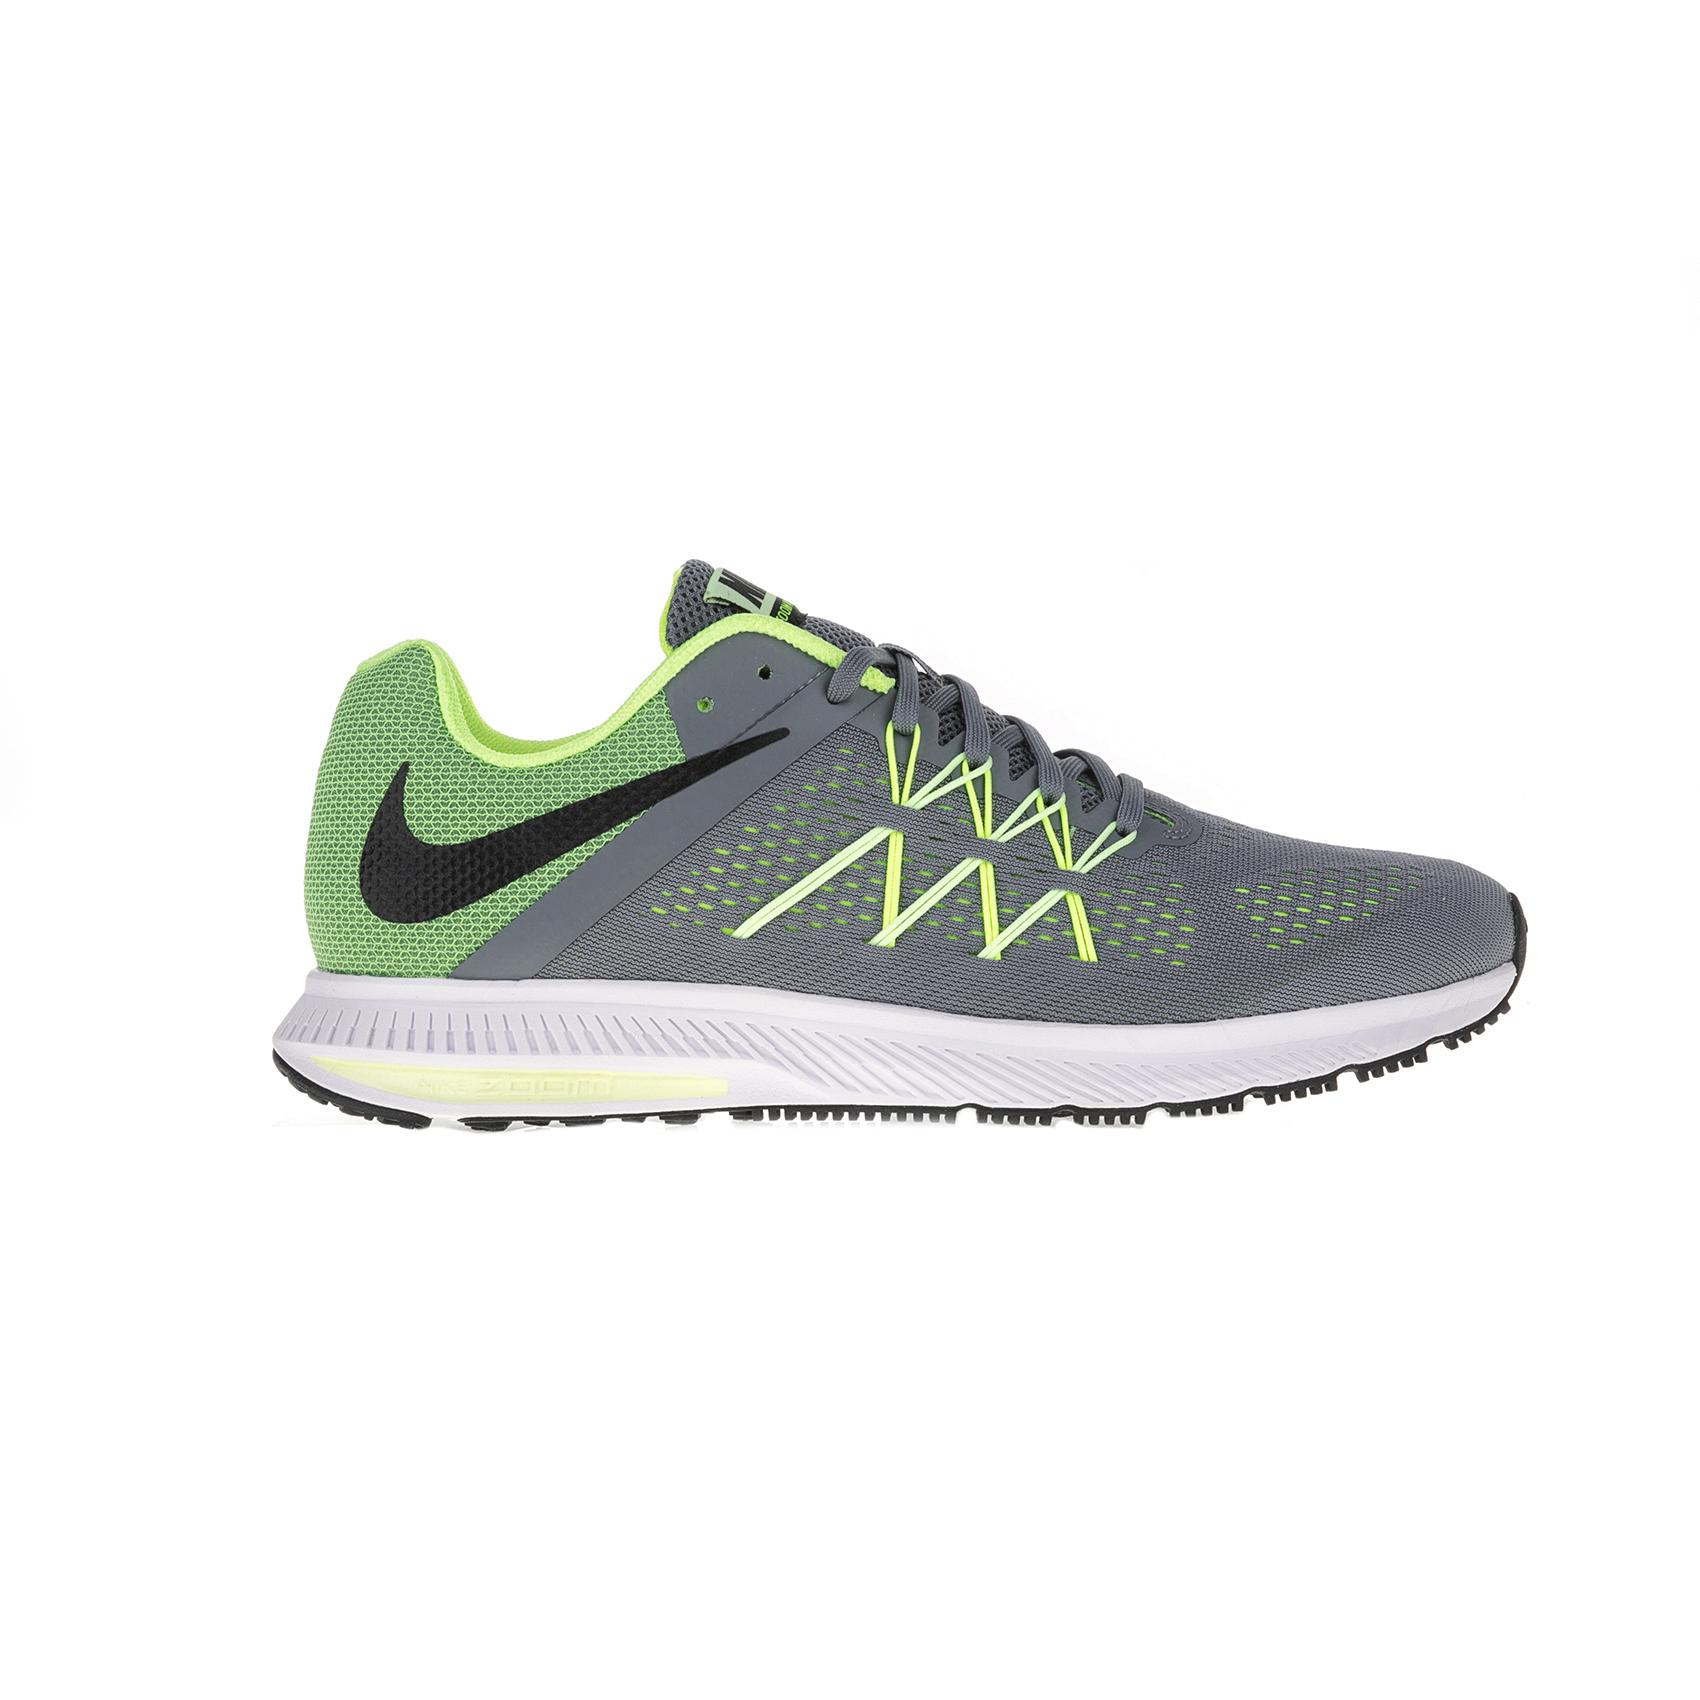 NIKE – Ανδρικά αθλητικά παπούτσια Nike ZOOM WINFLO 3 γκρι – πράσινα